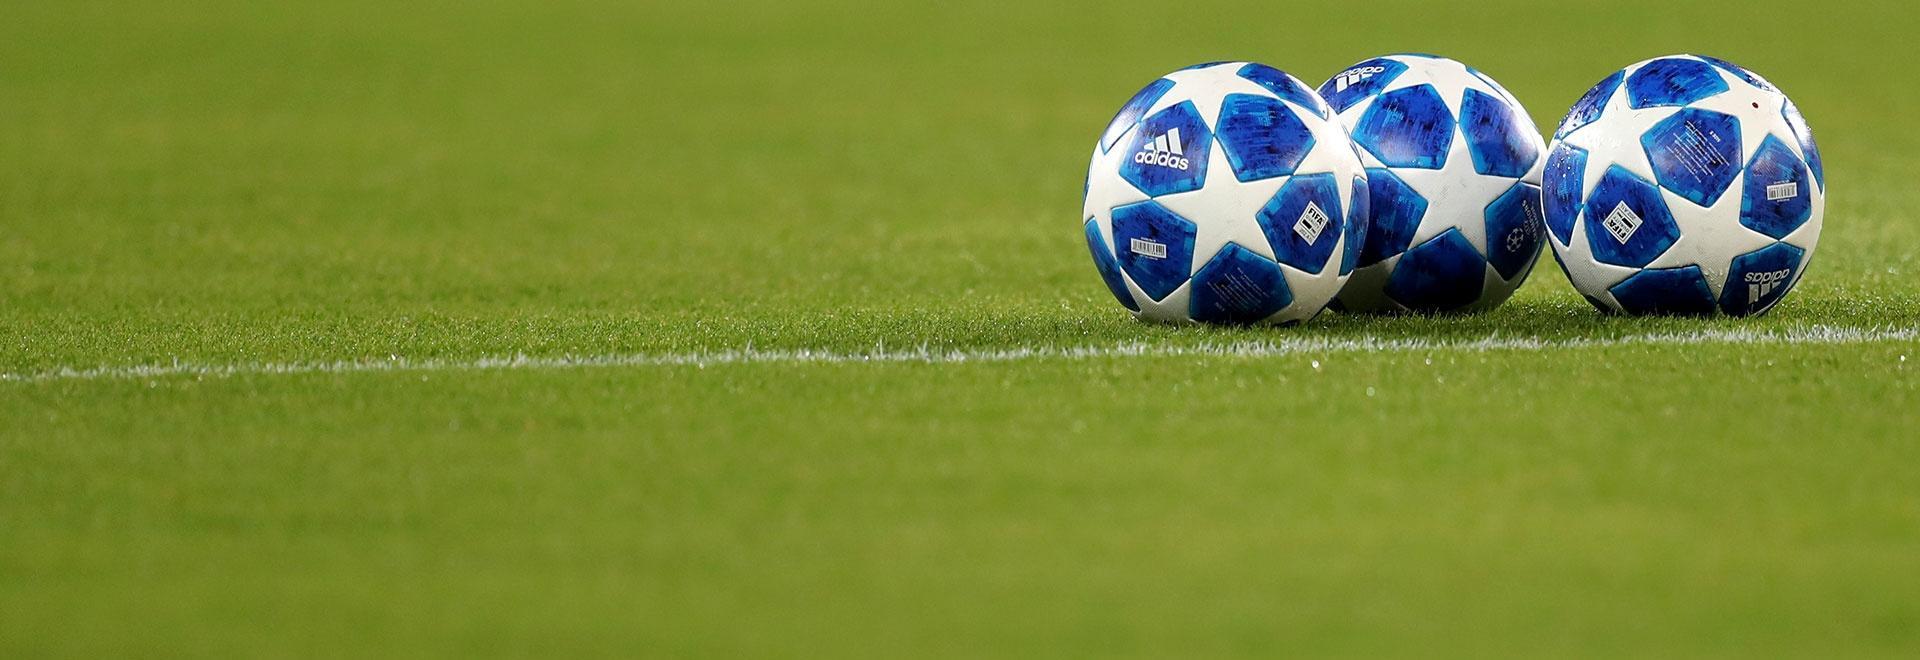 Slavia Praga - Inter 27//11/19